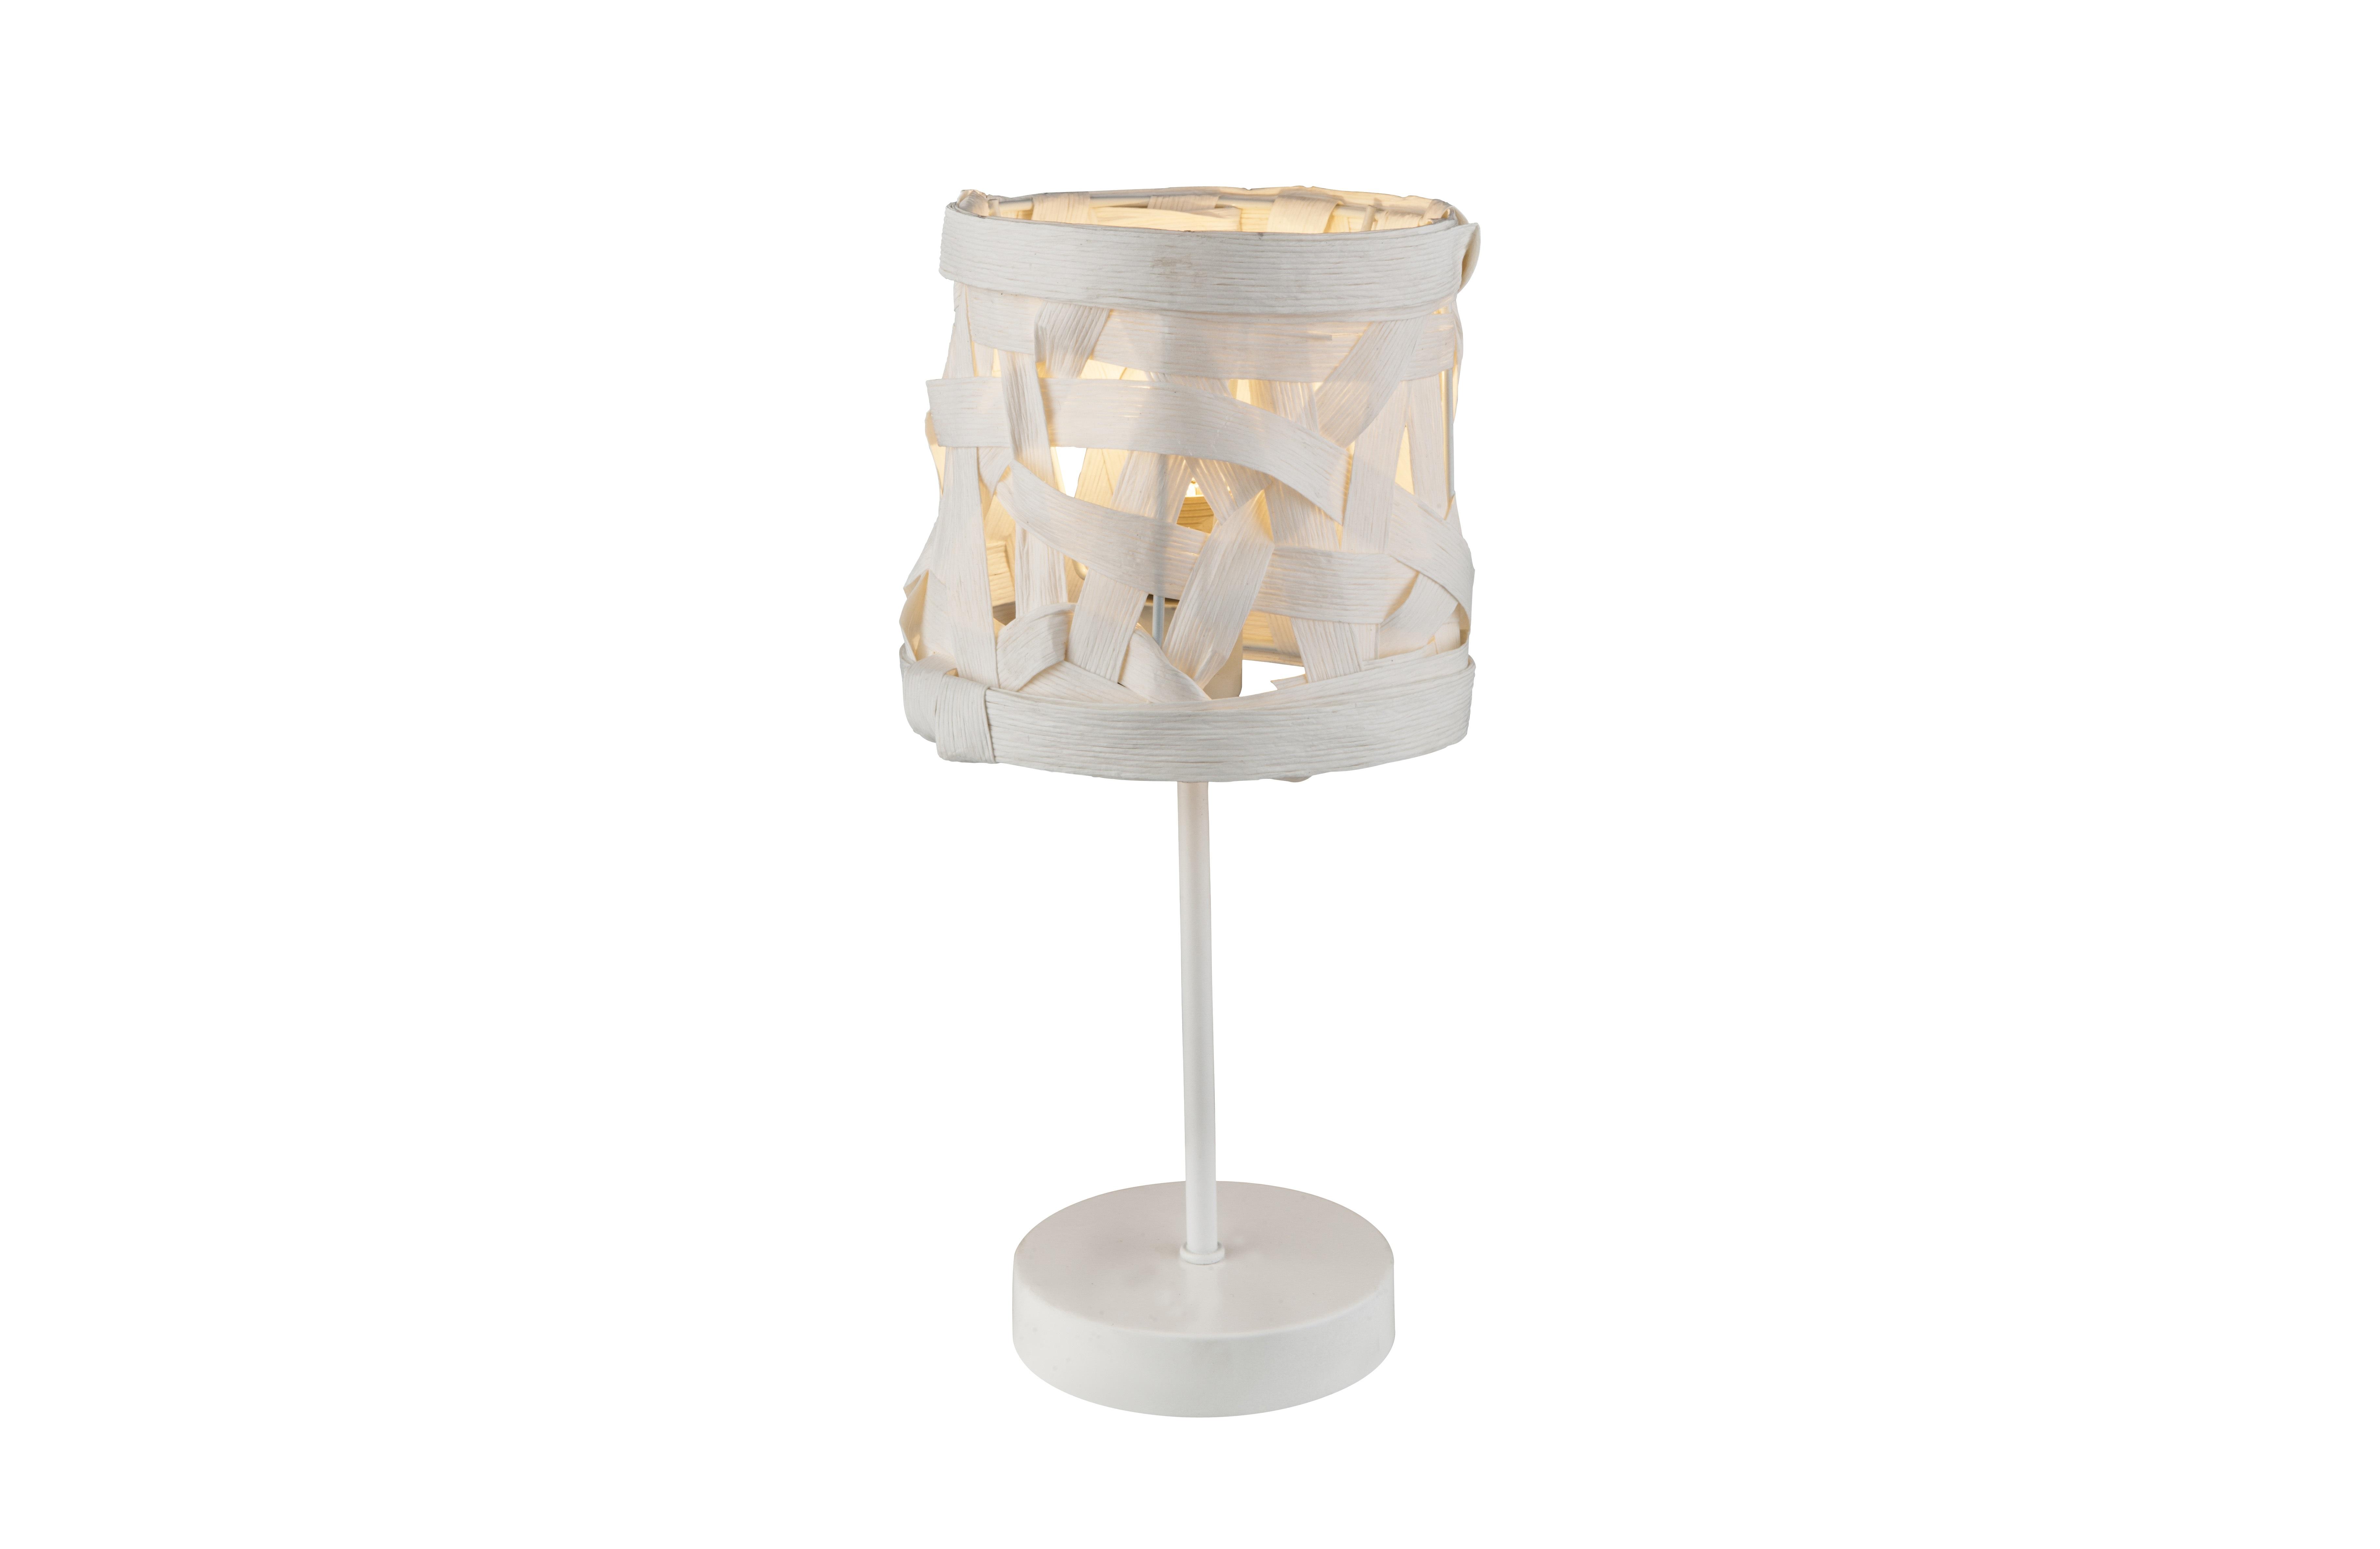 Настольная лампа. Производитель: Globo, артикул: 65572